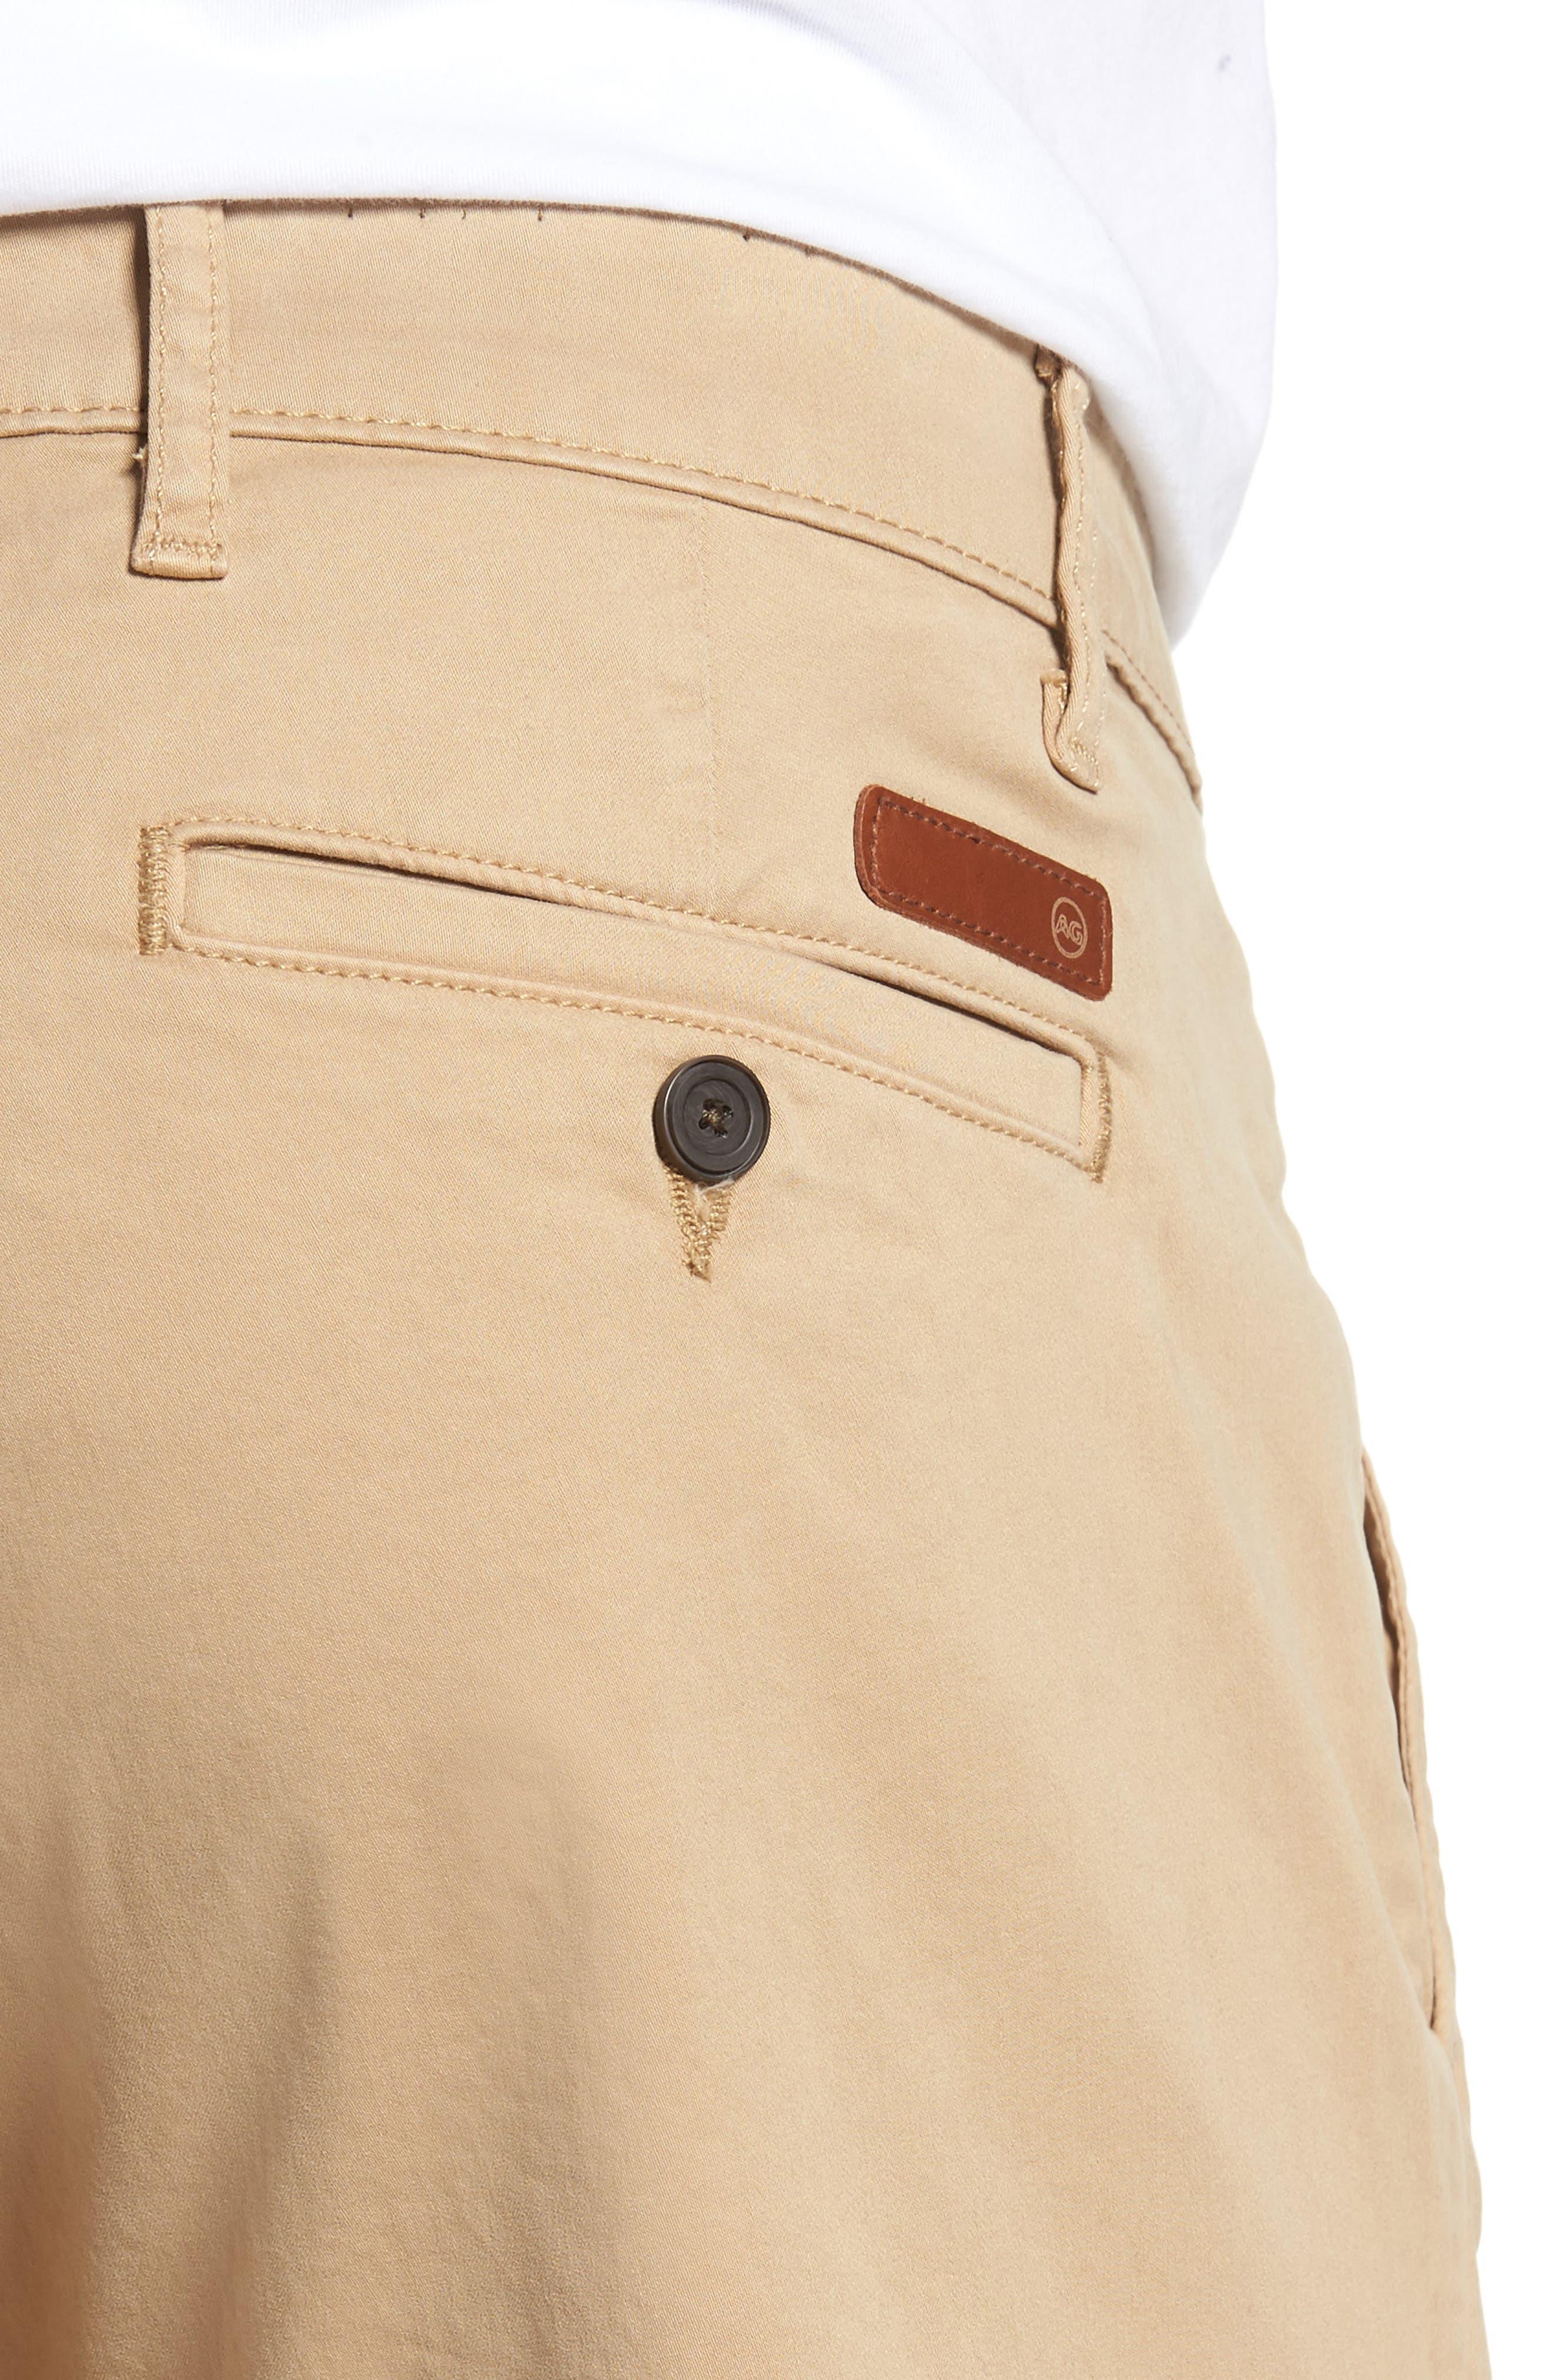 Wanderer Modern Slim Fit Shorts,                             Alternate thumbnail 4, color,                             244